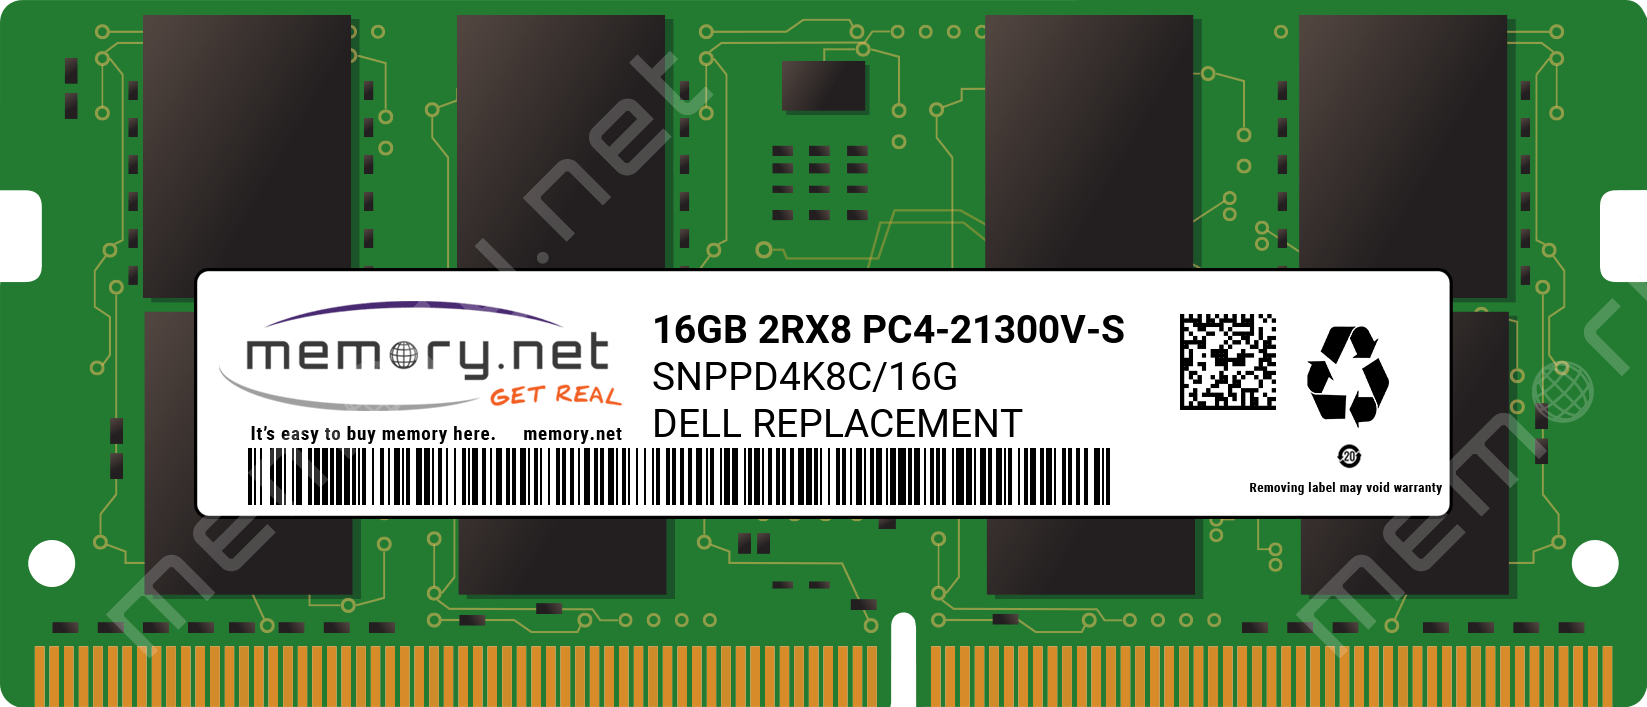 SNPPD4K8C/16G